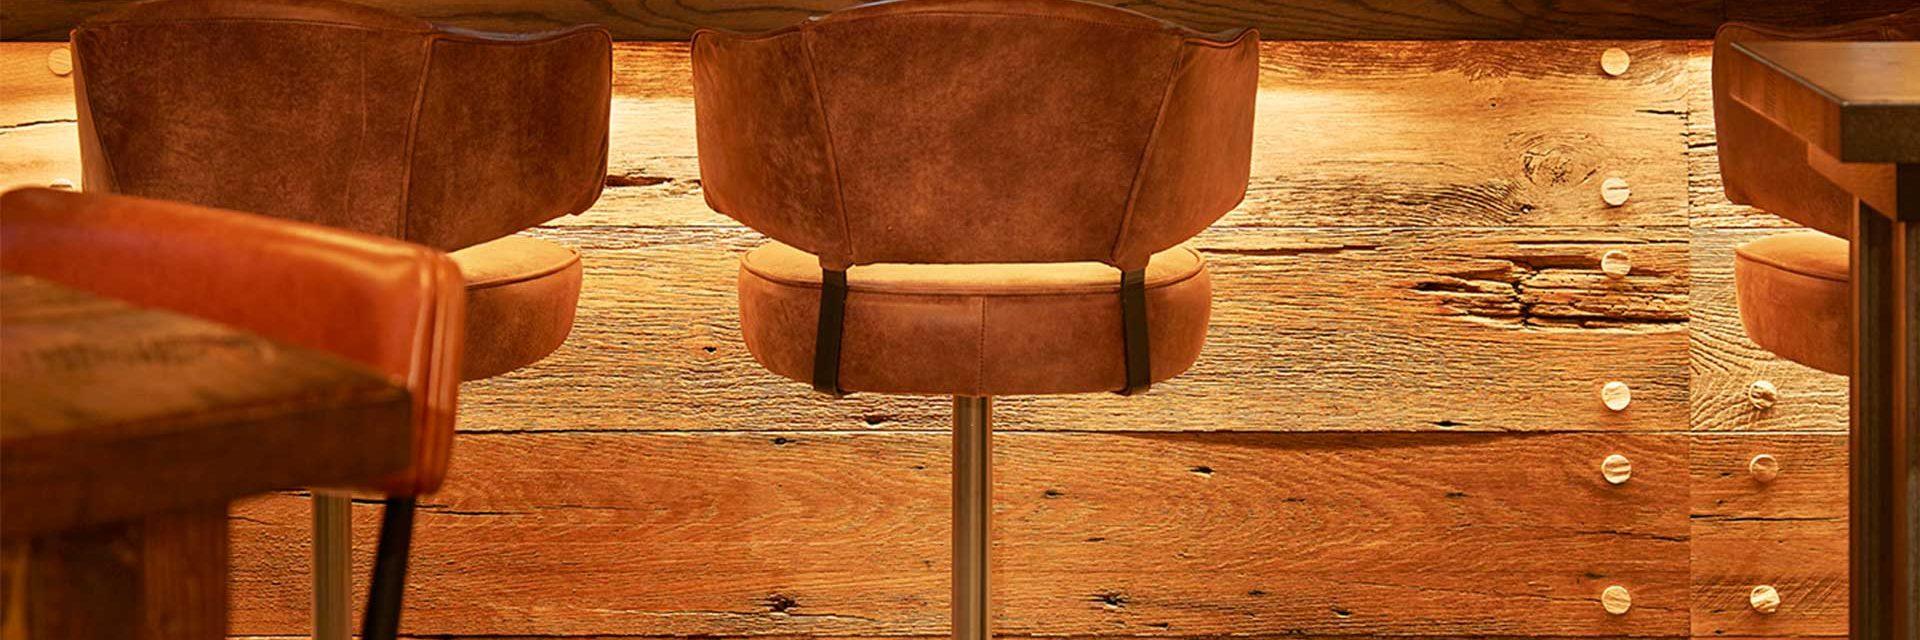 brown bar stool with metal base